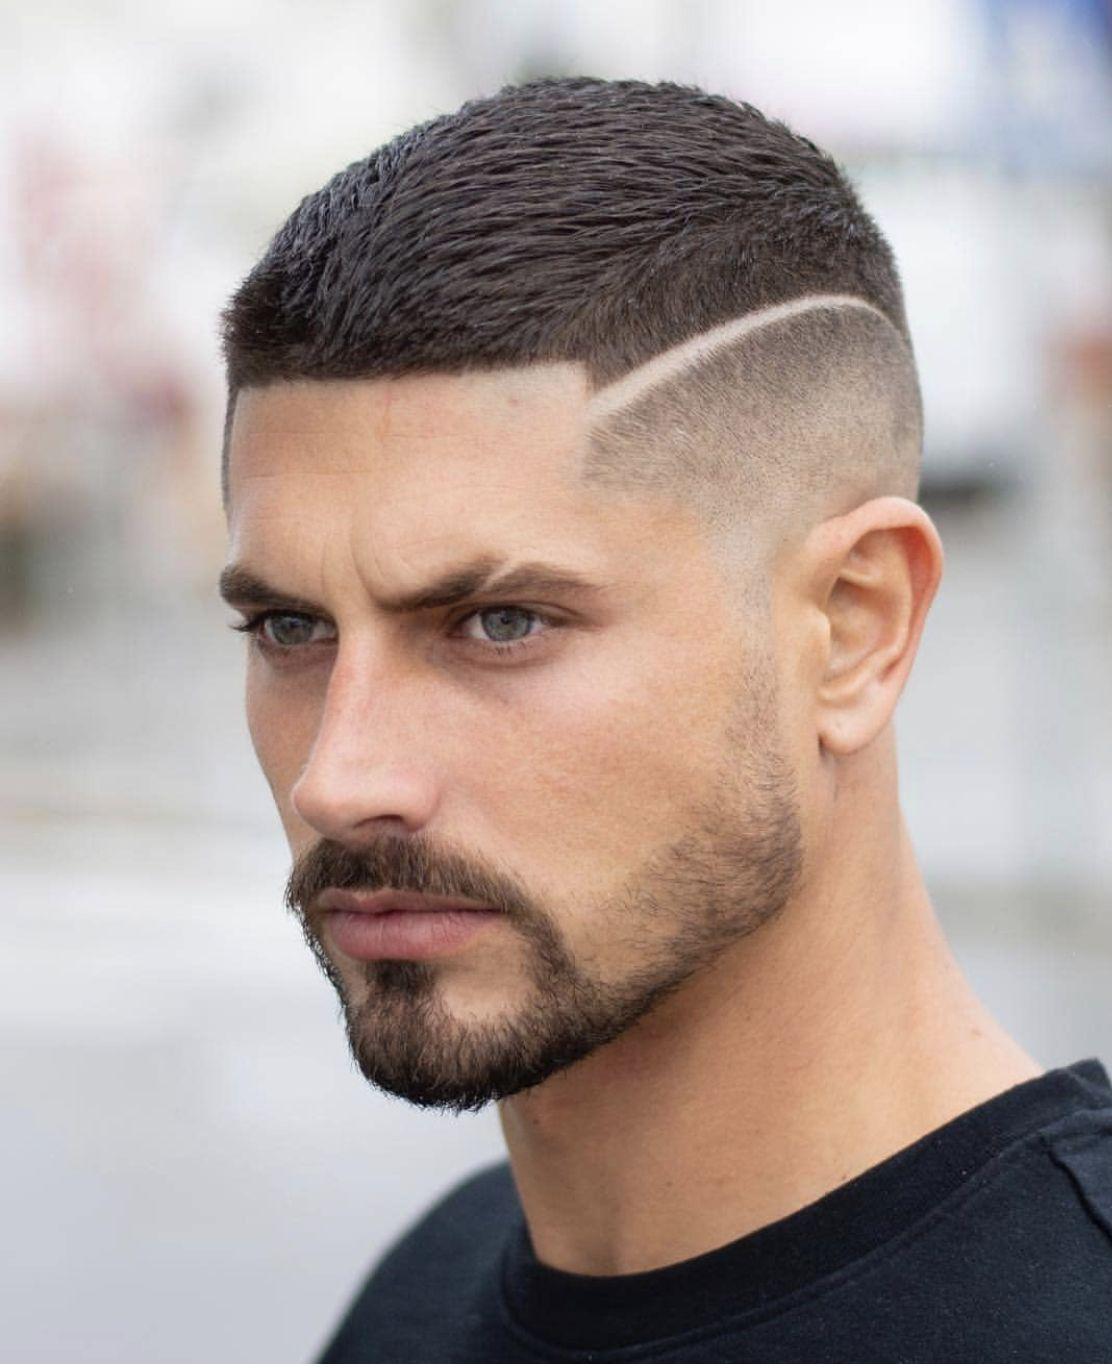 Pin by Randall Anderson on Haircut hairstyles  Mens haircuts